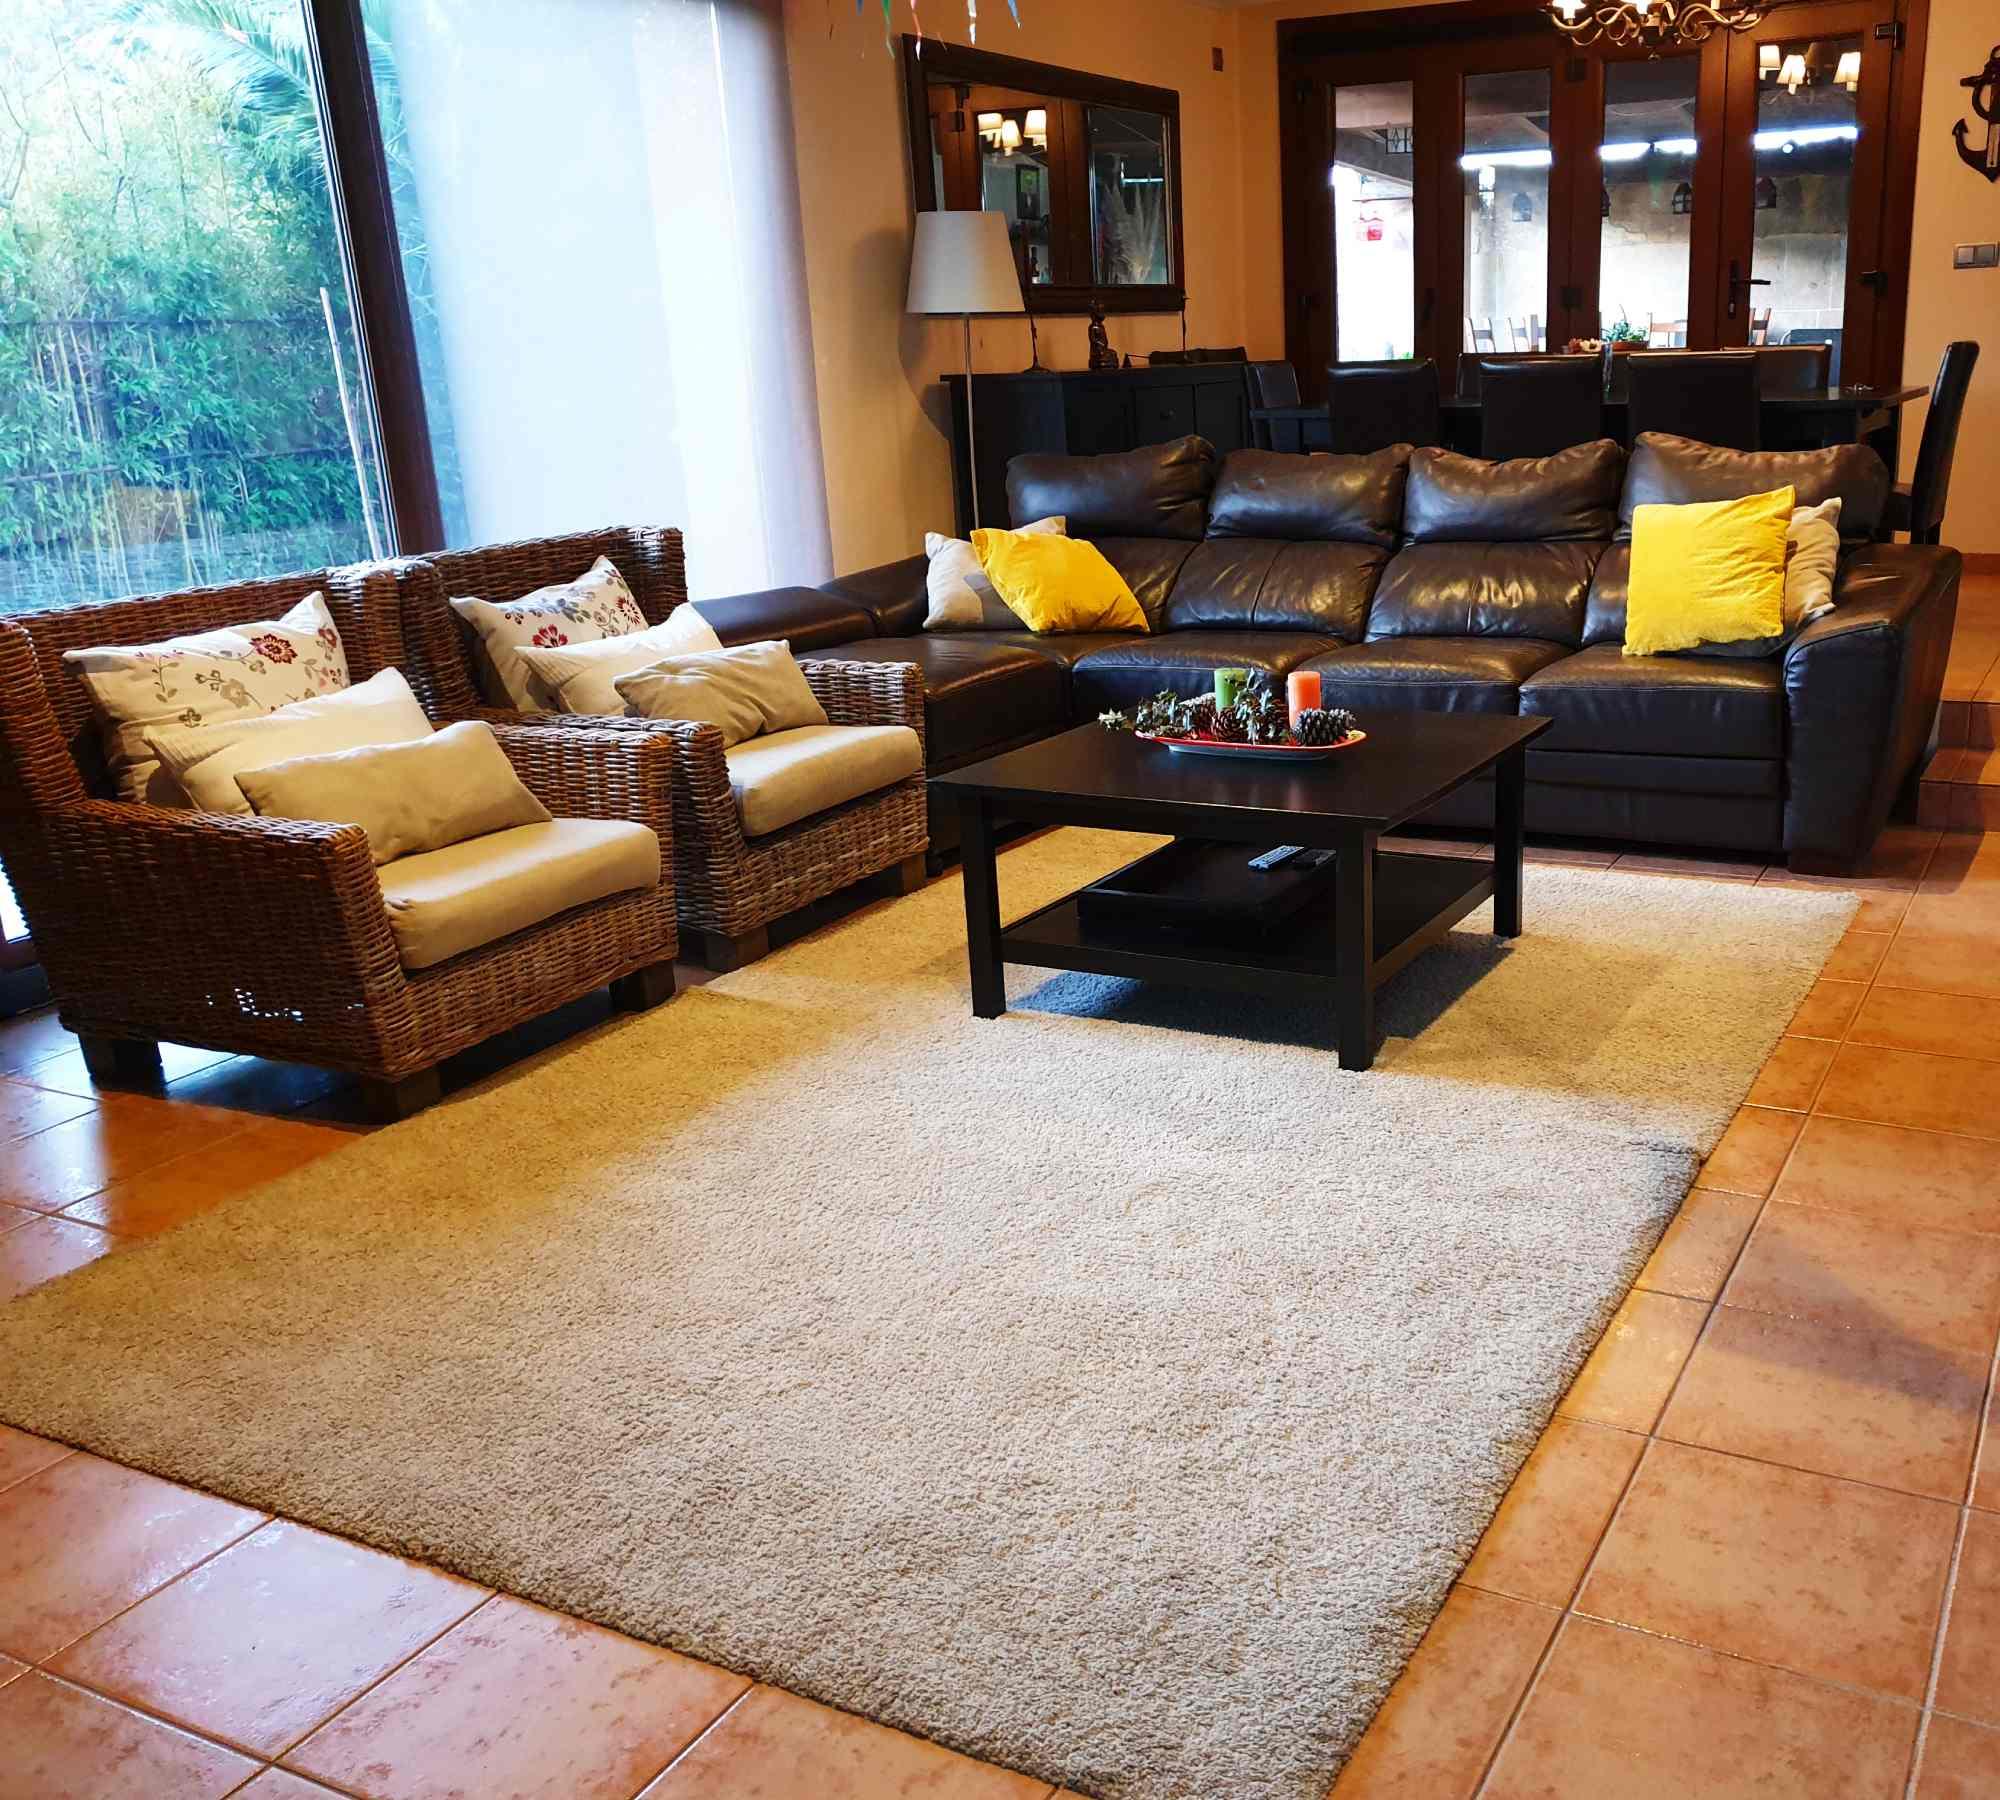 salon-alfombra-mesa-sofa-casaomillon